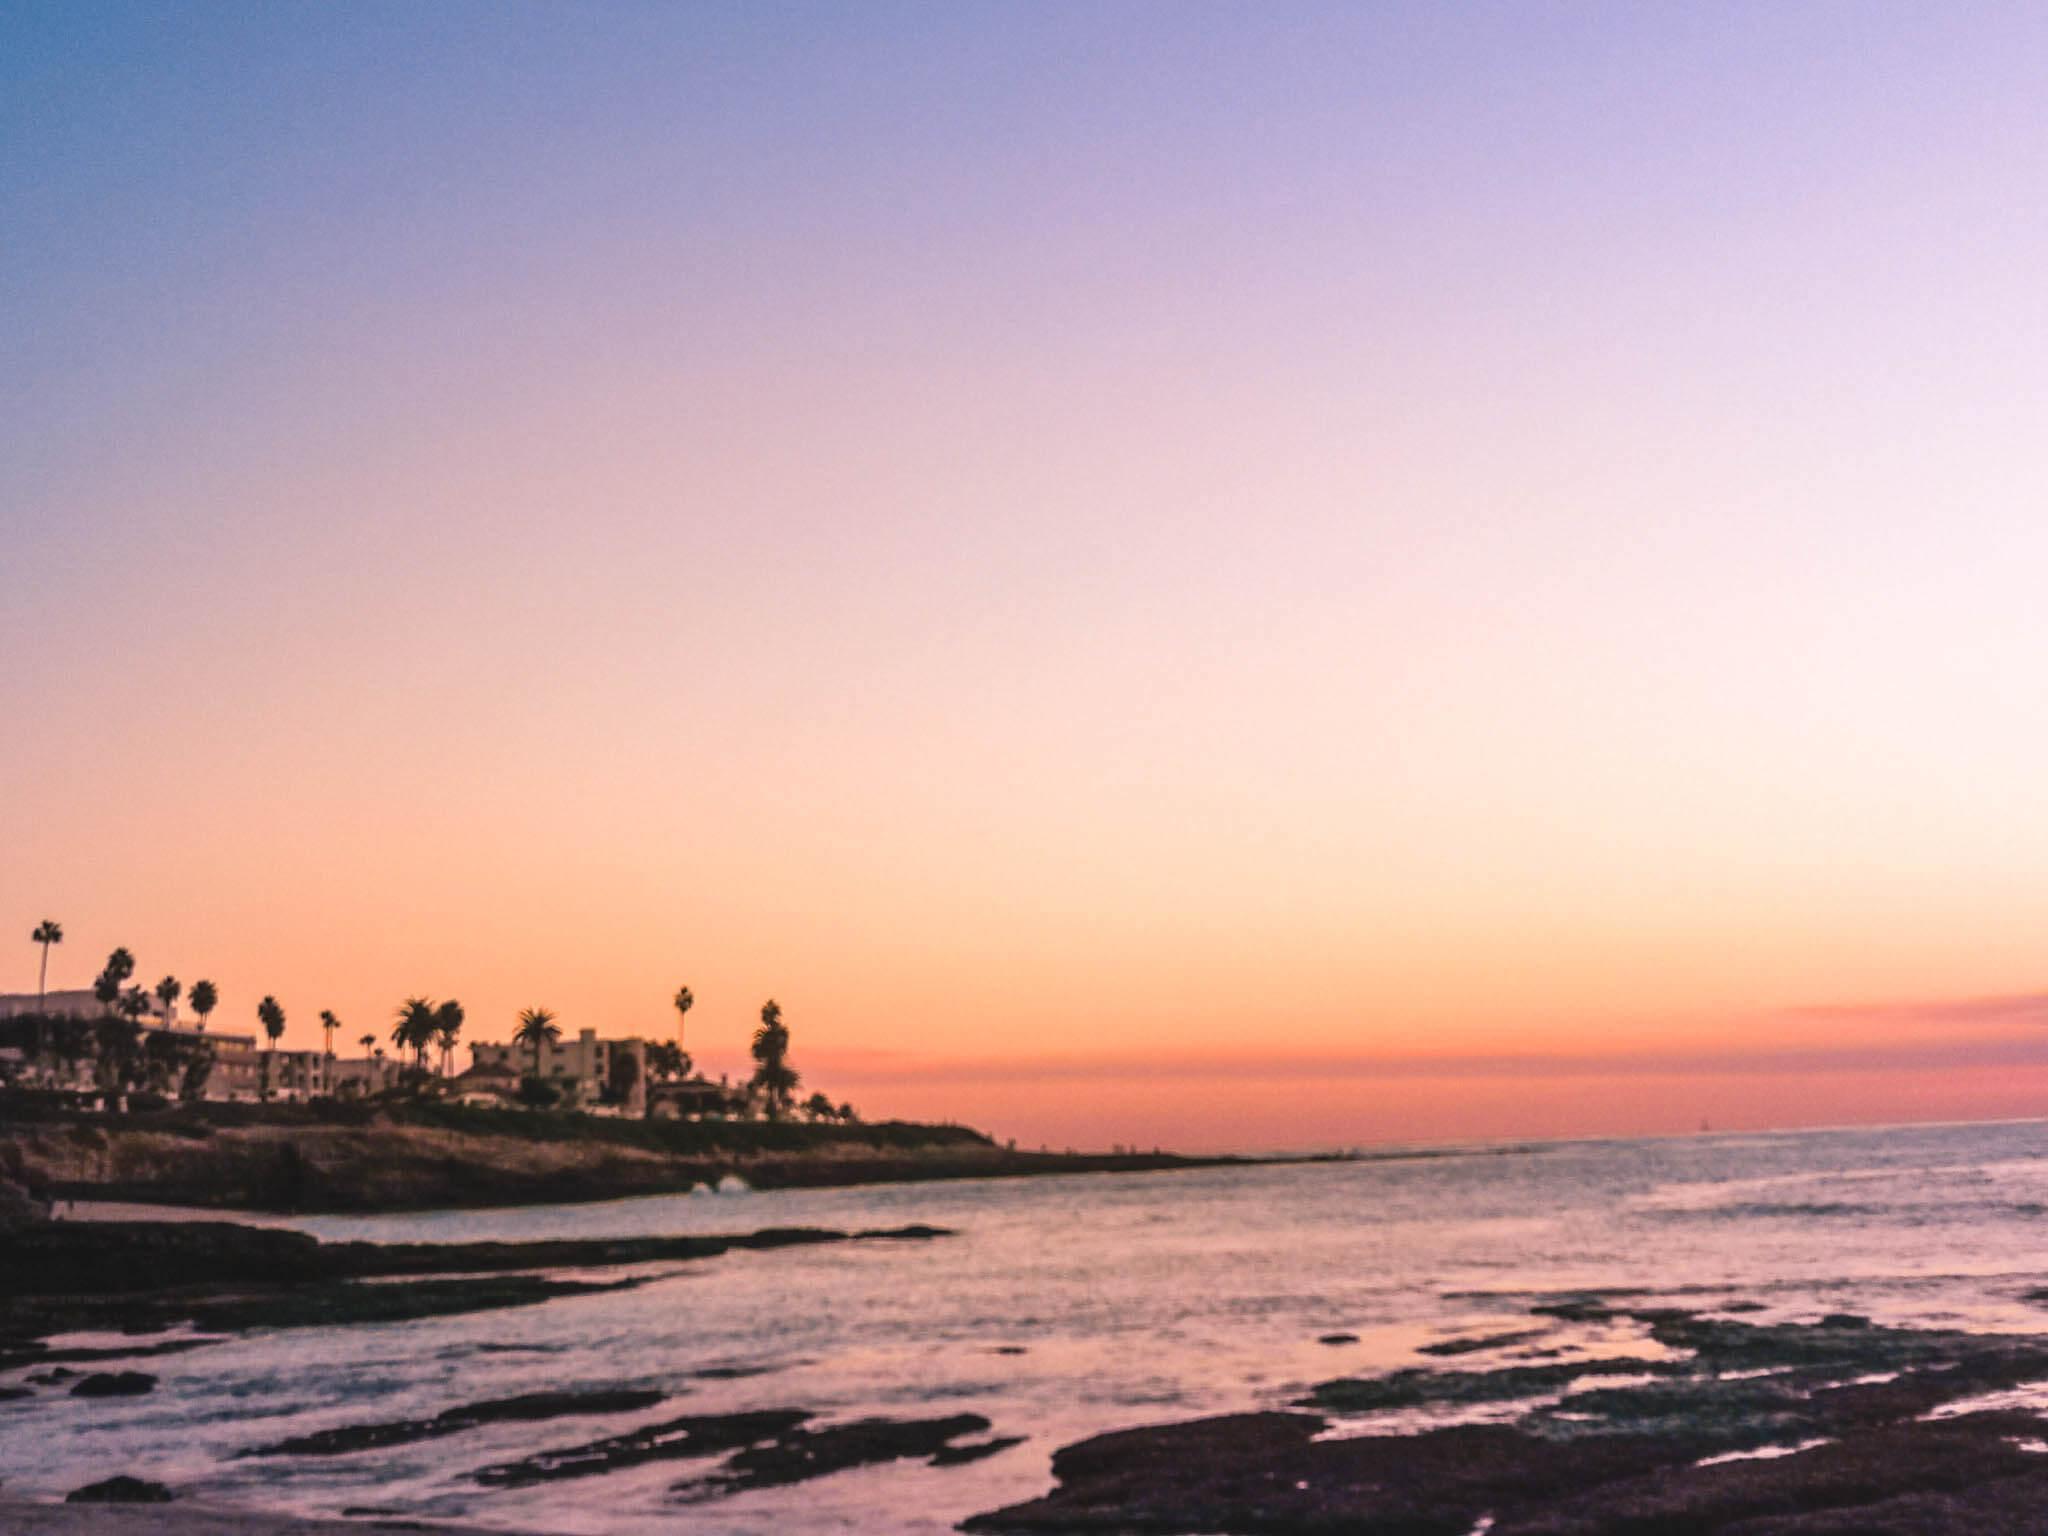 Weeeknd in San Diego